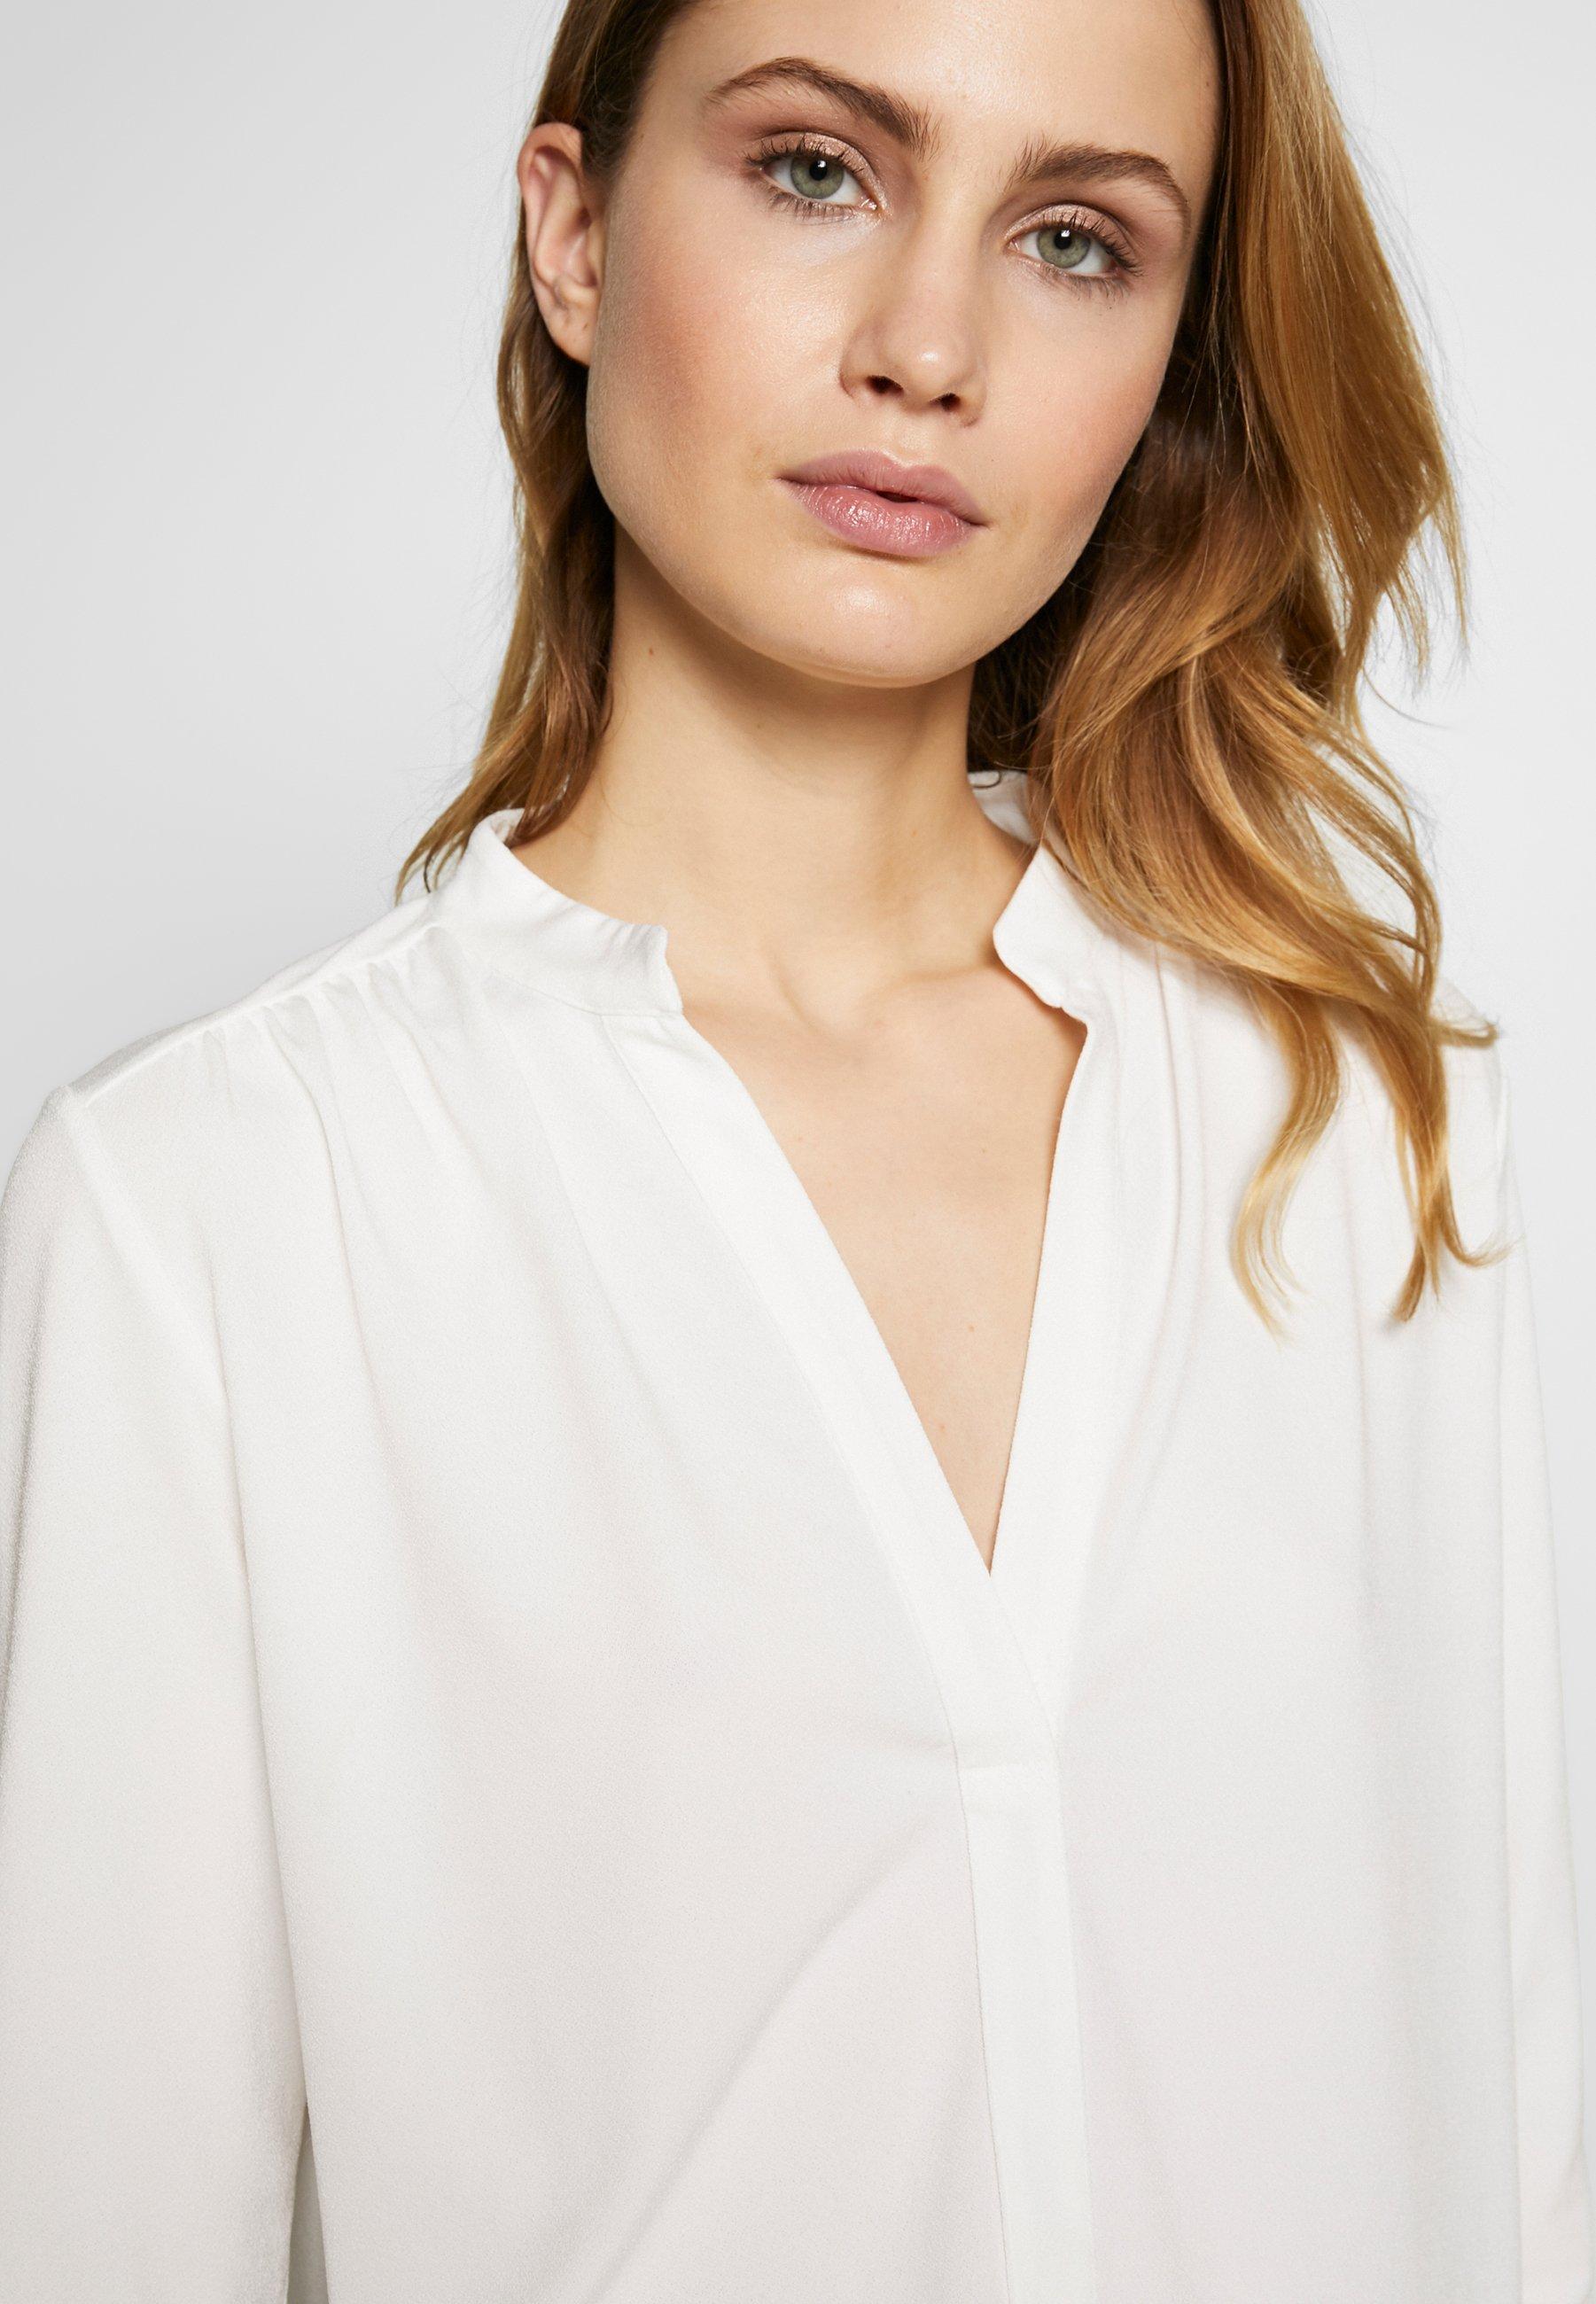 Inwear Alanaiw Blouse - Long Sleeved Top White Smoke UK